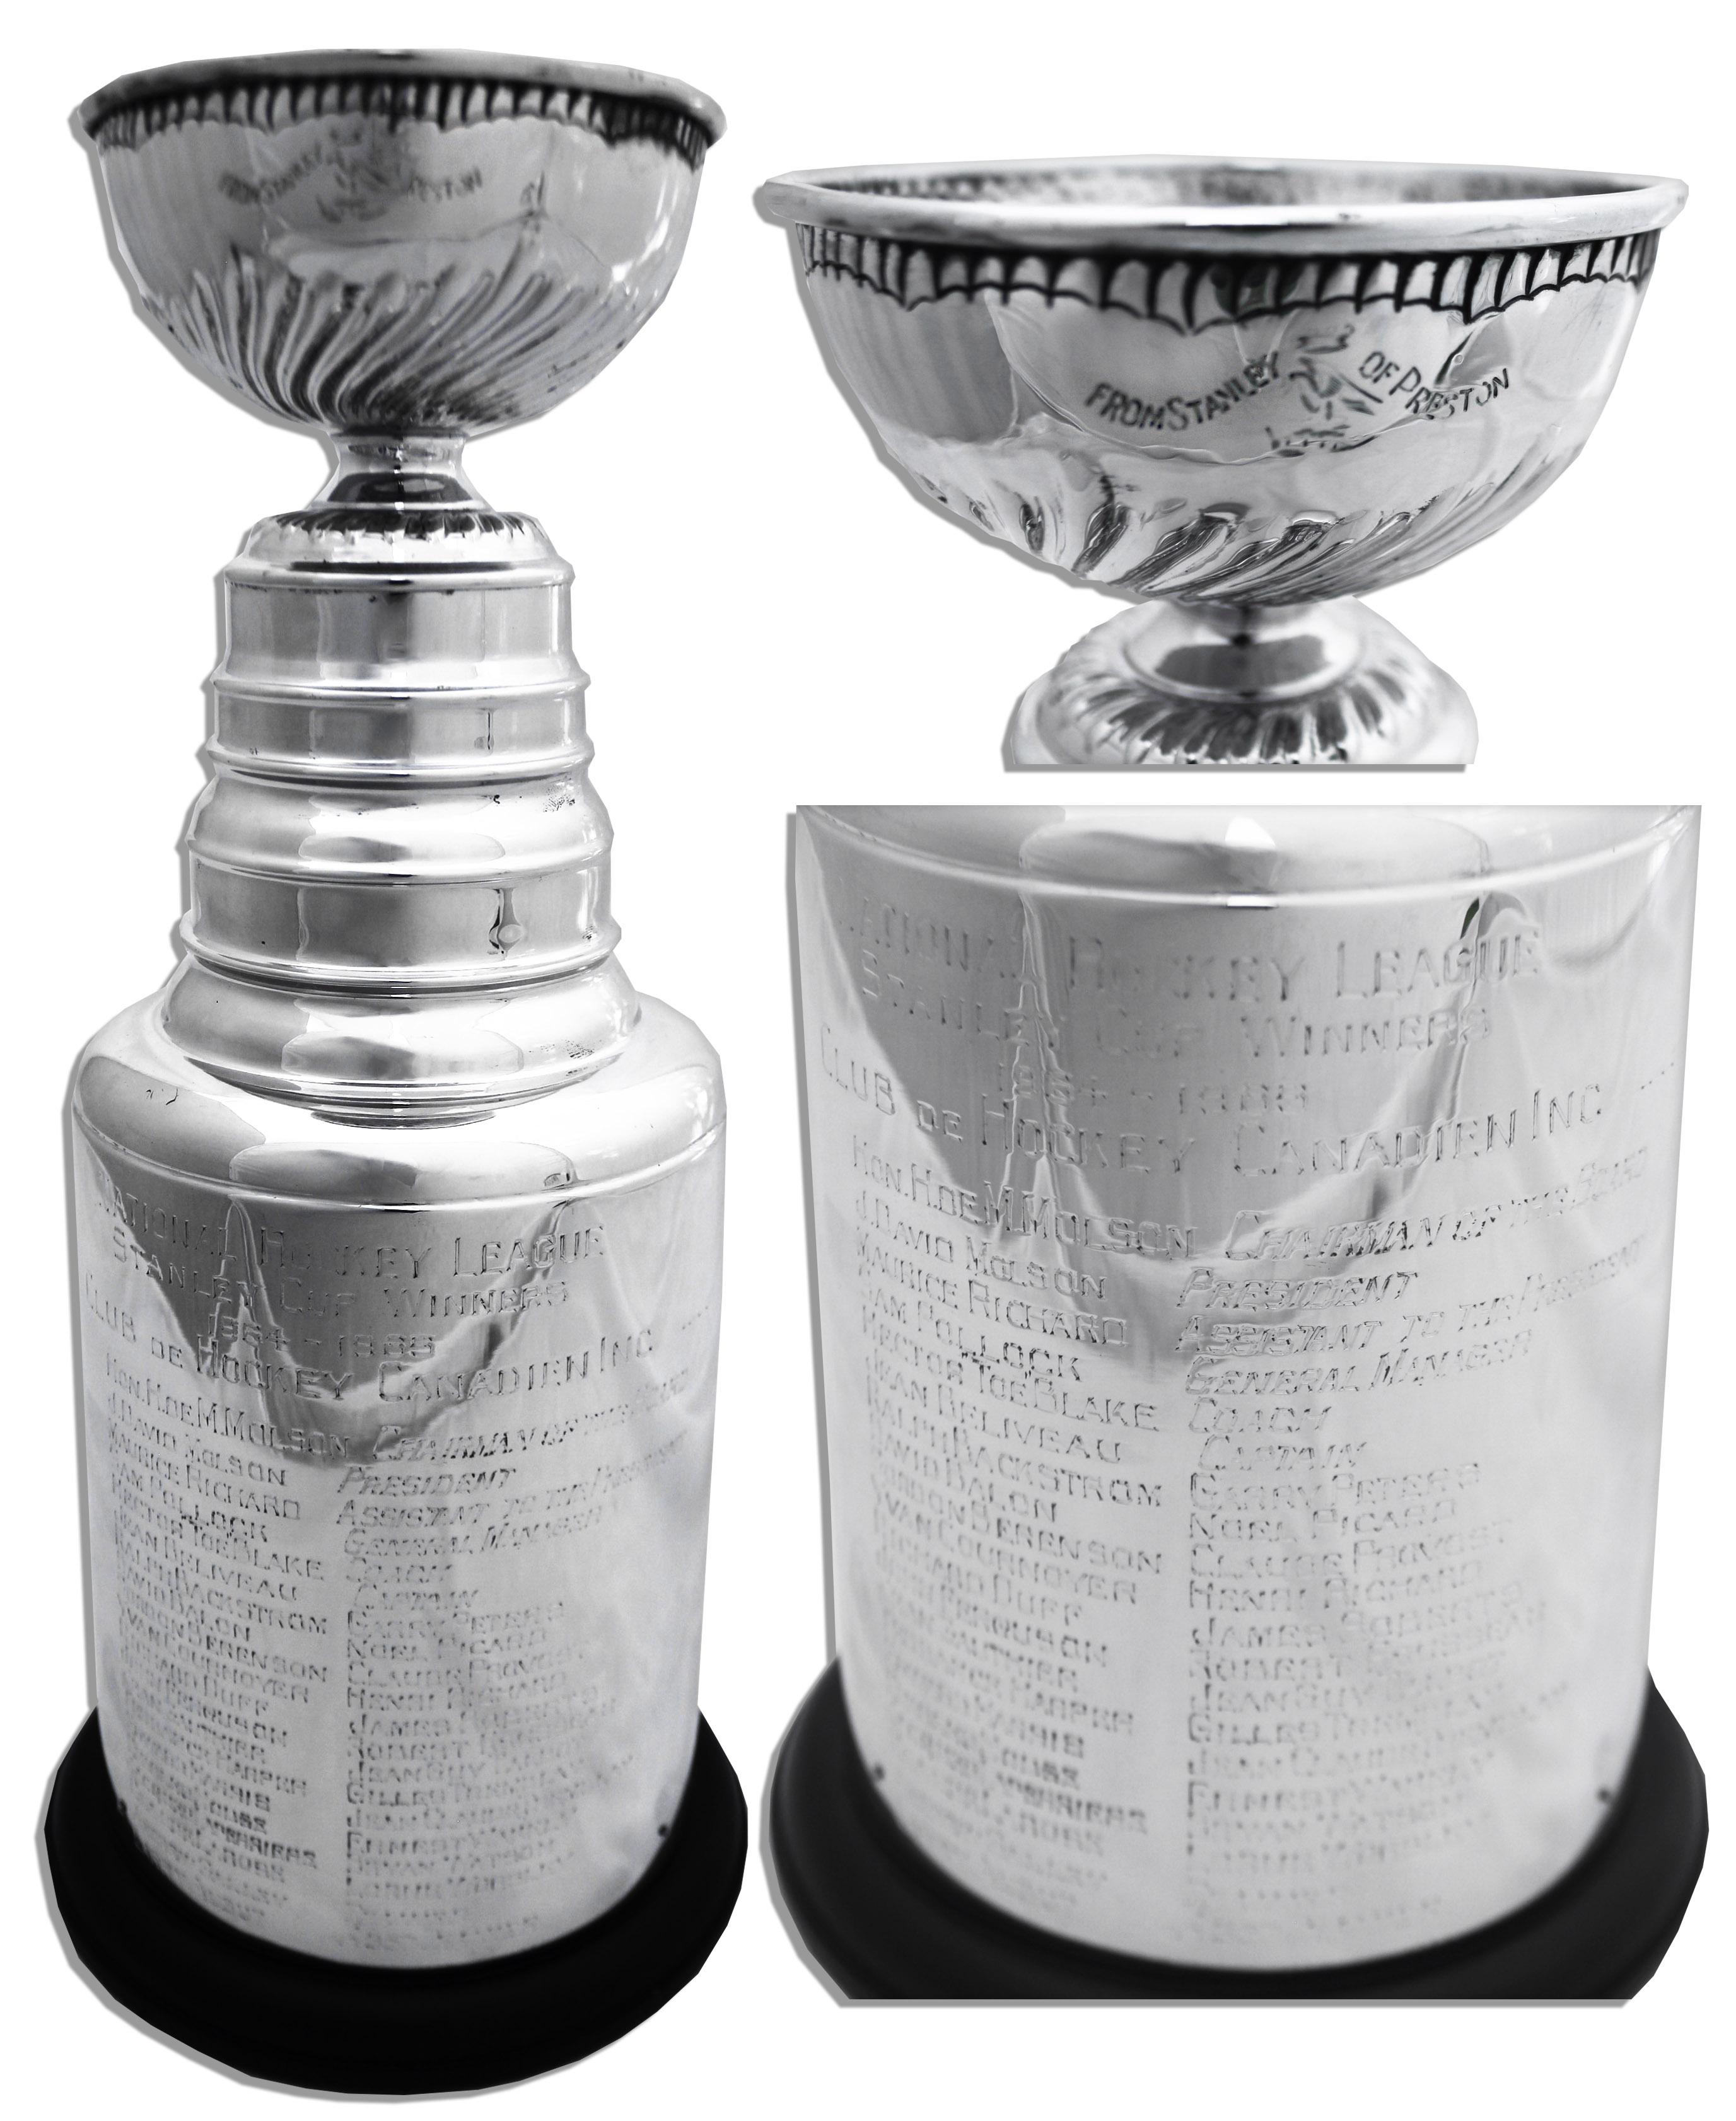 Miniature Stanley Cup trophy